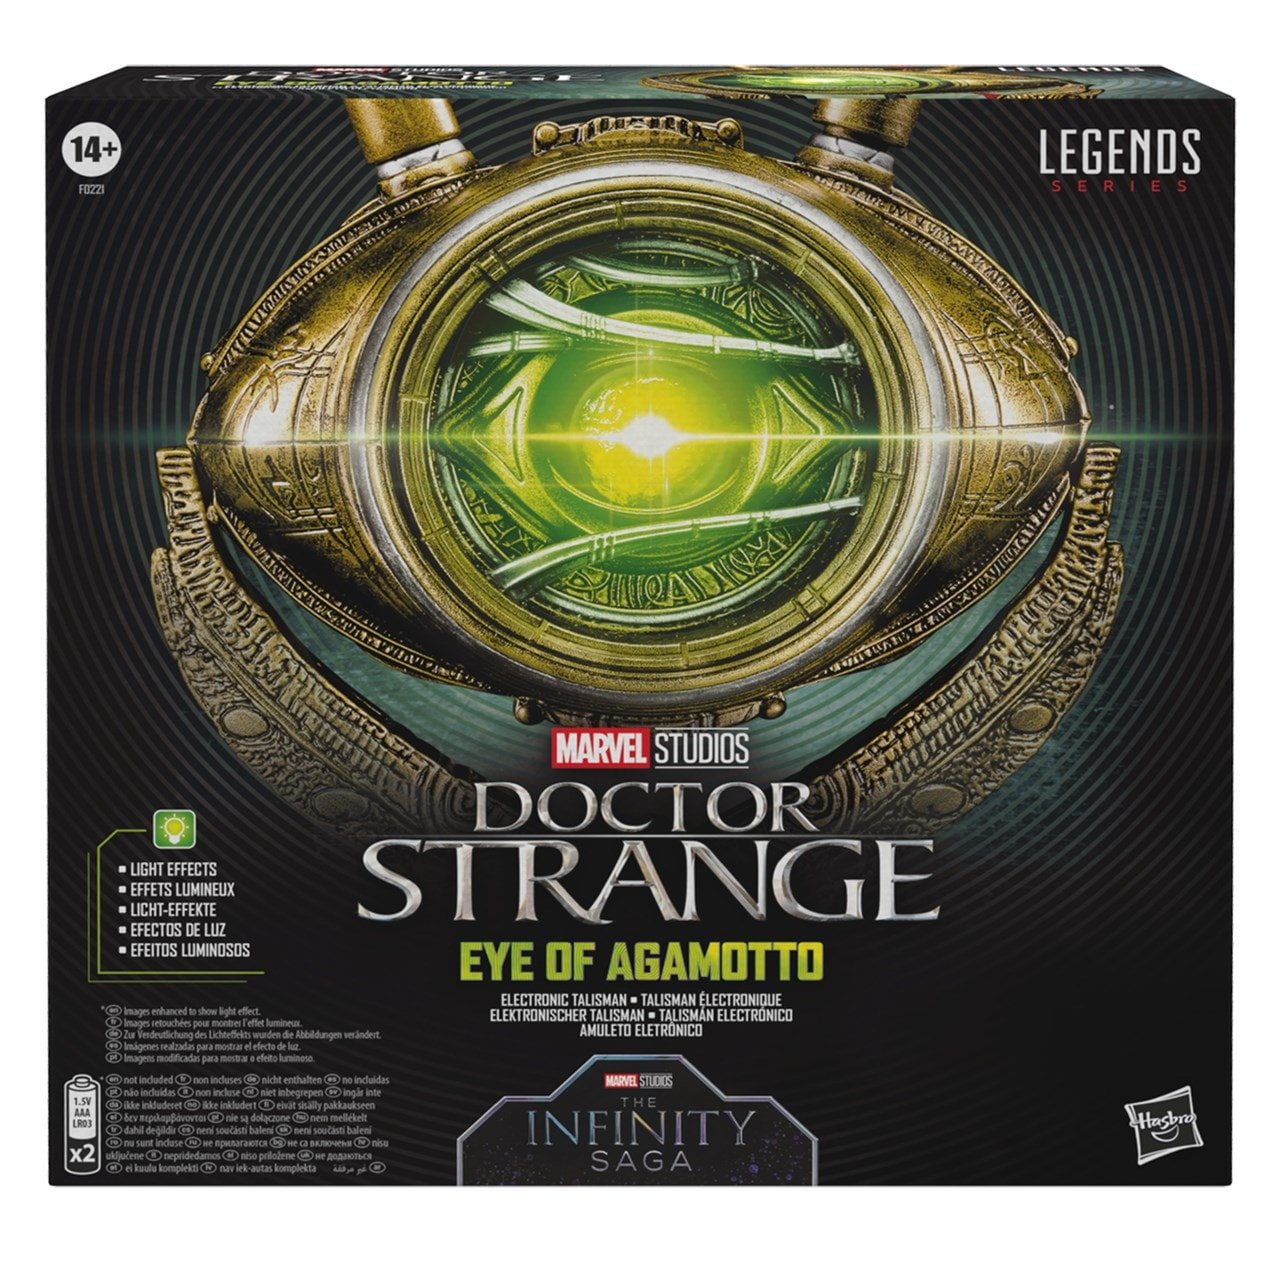 Hasbro Marvel Legends Doctor Strange Eye of Agamotto Replica - 2